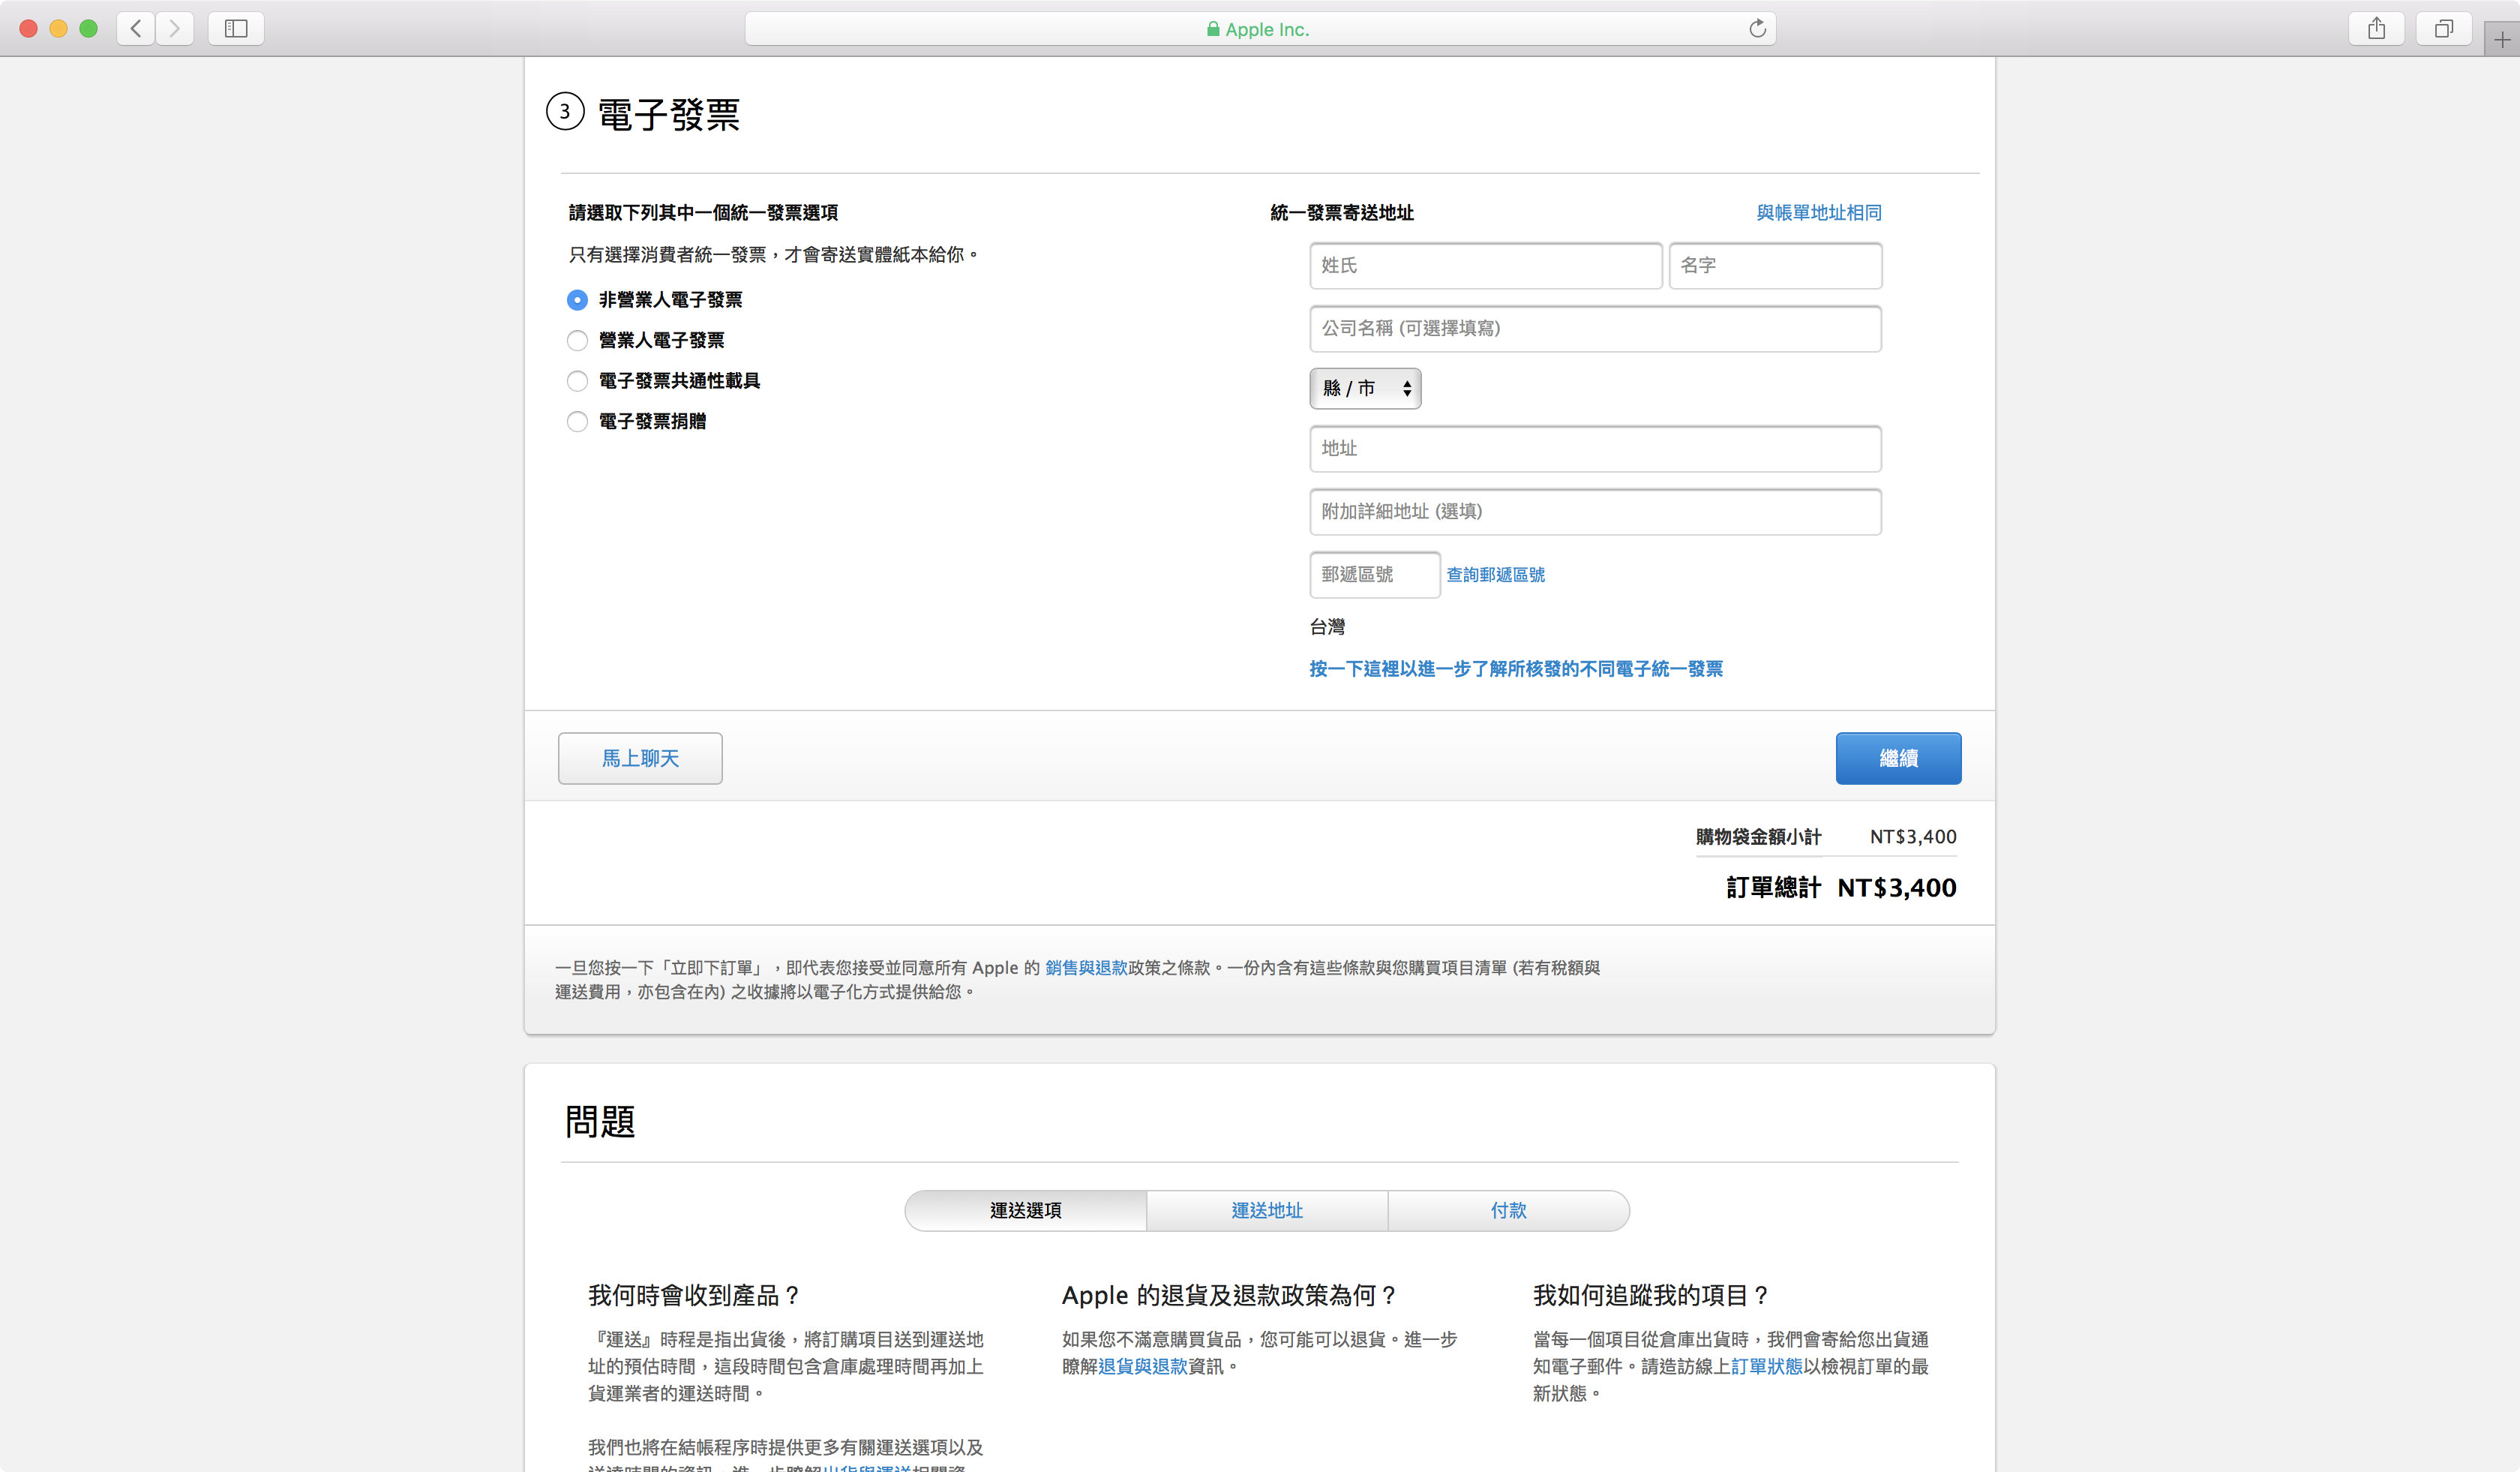 Apple online store - Invoice